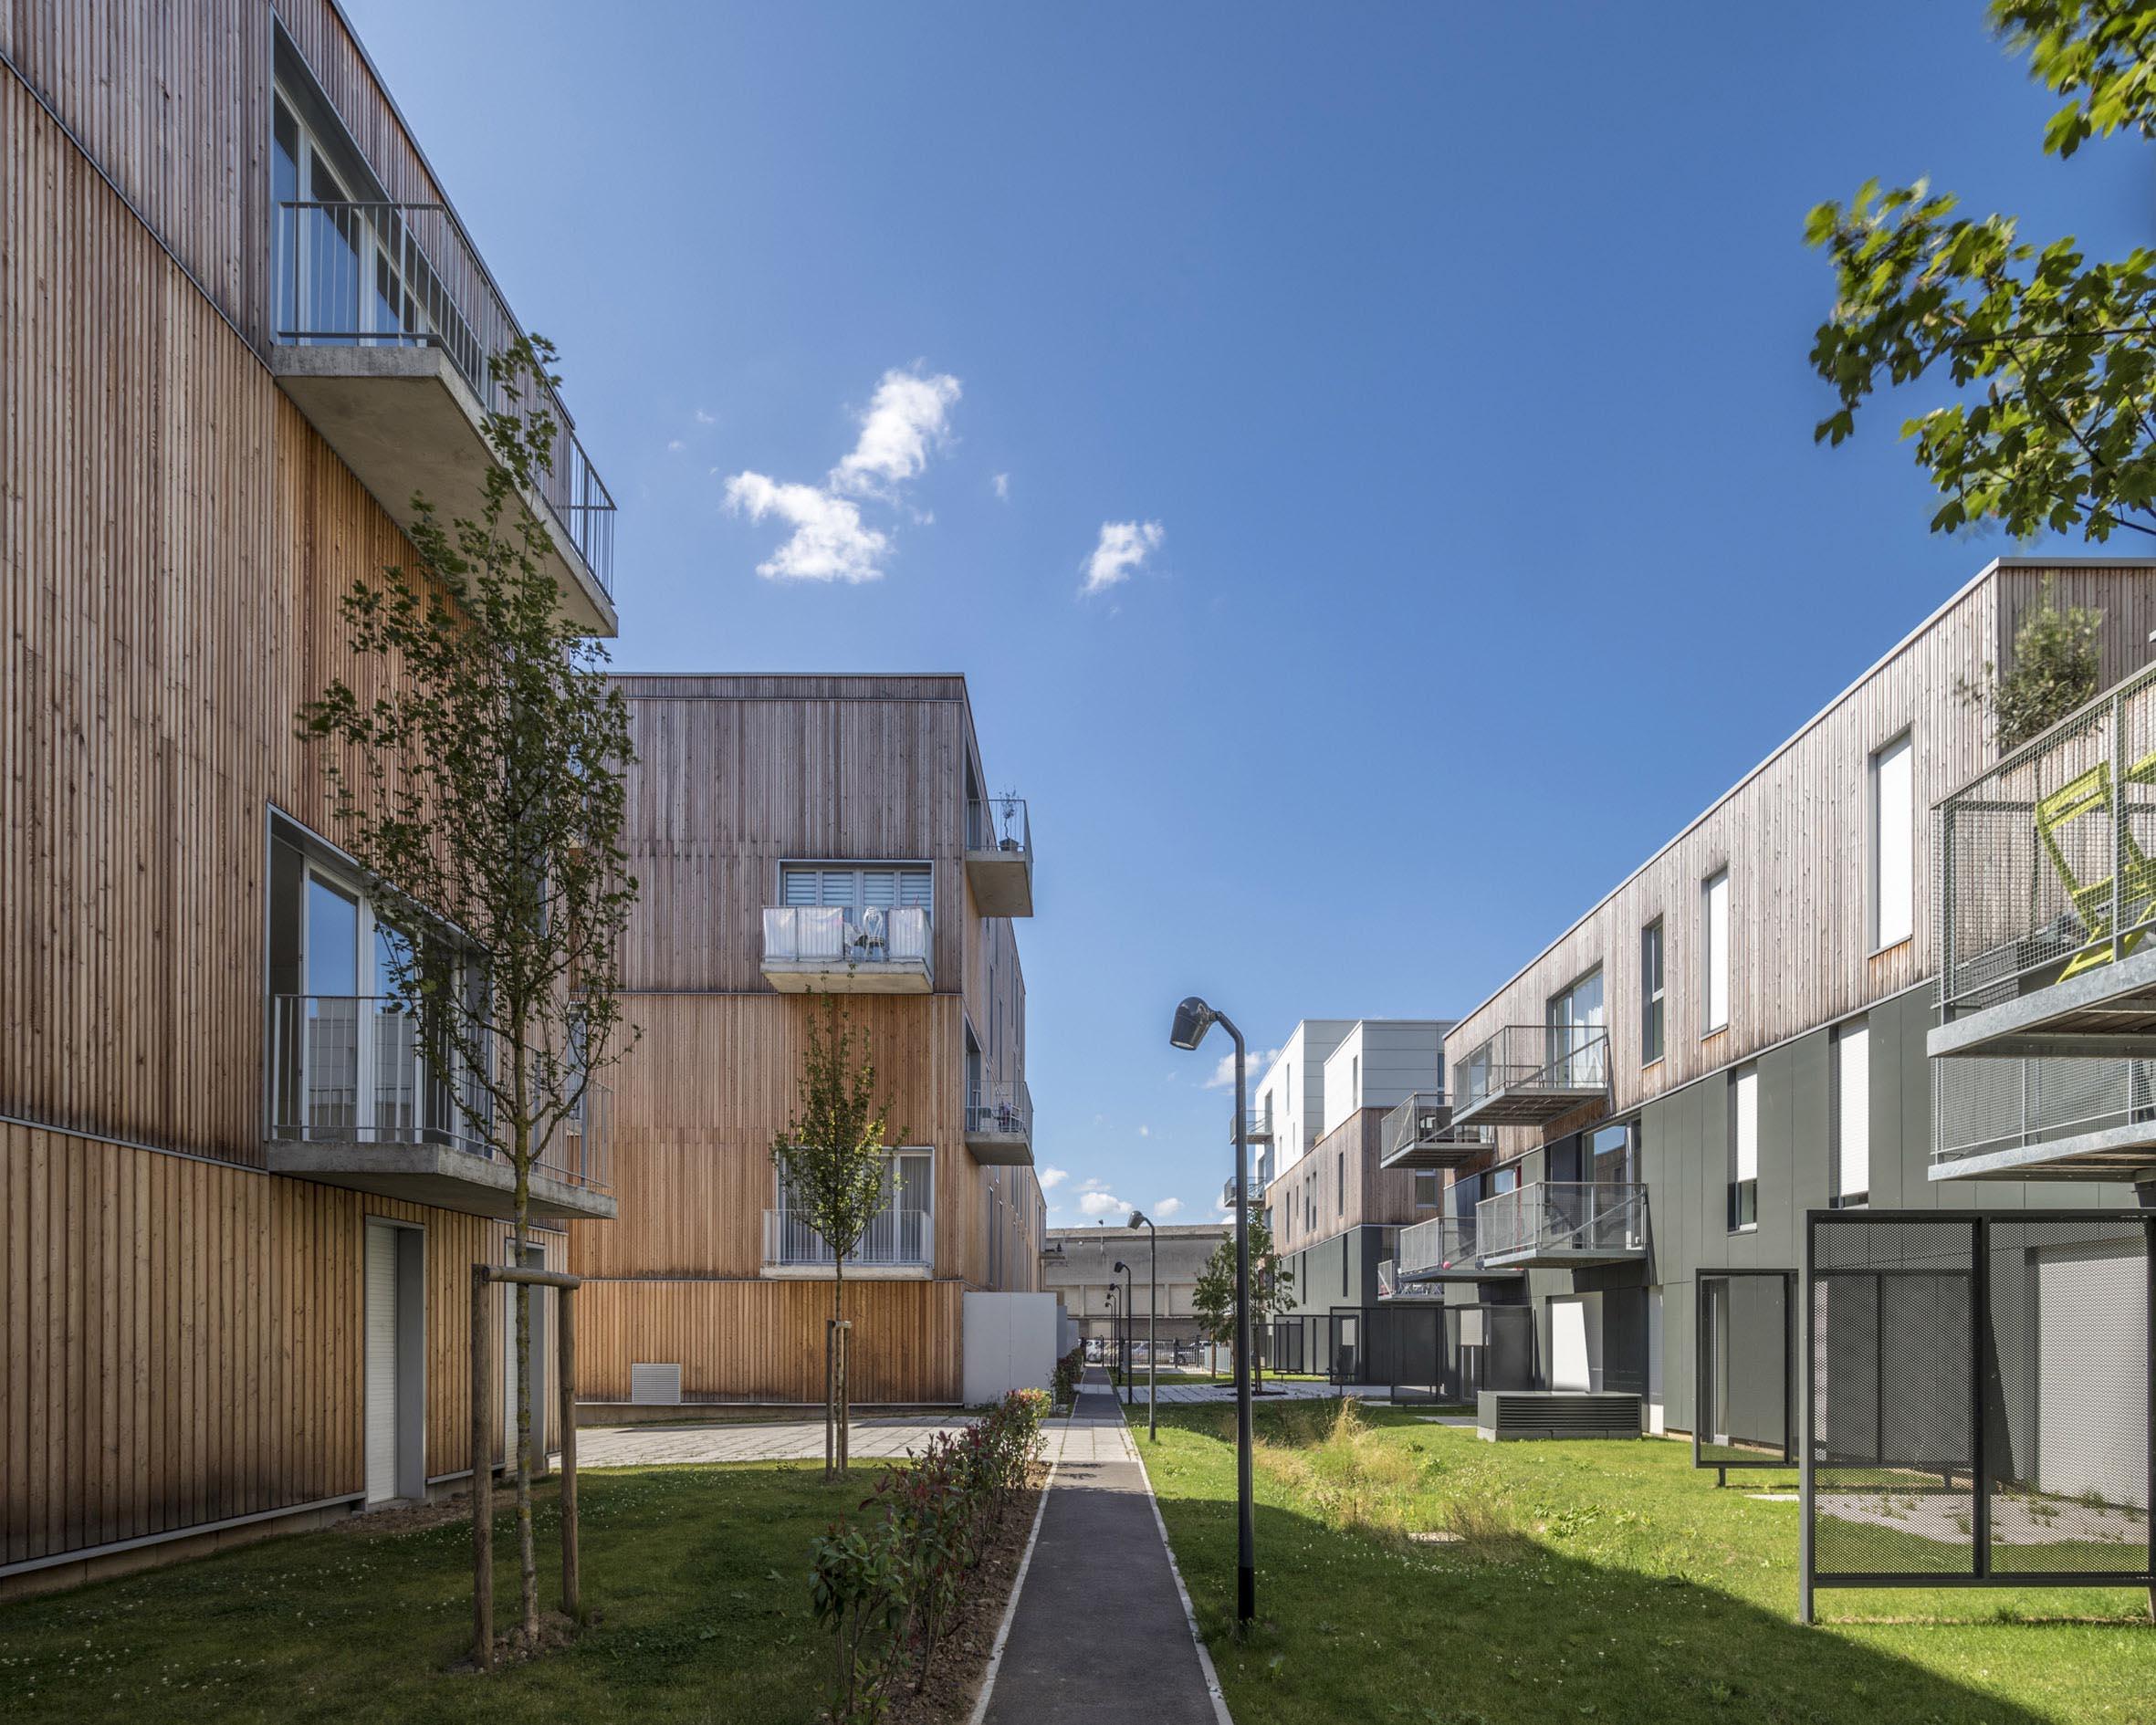 Residential Block Abattoires